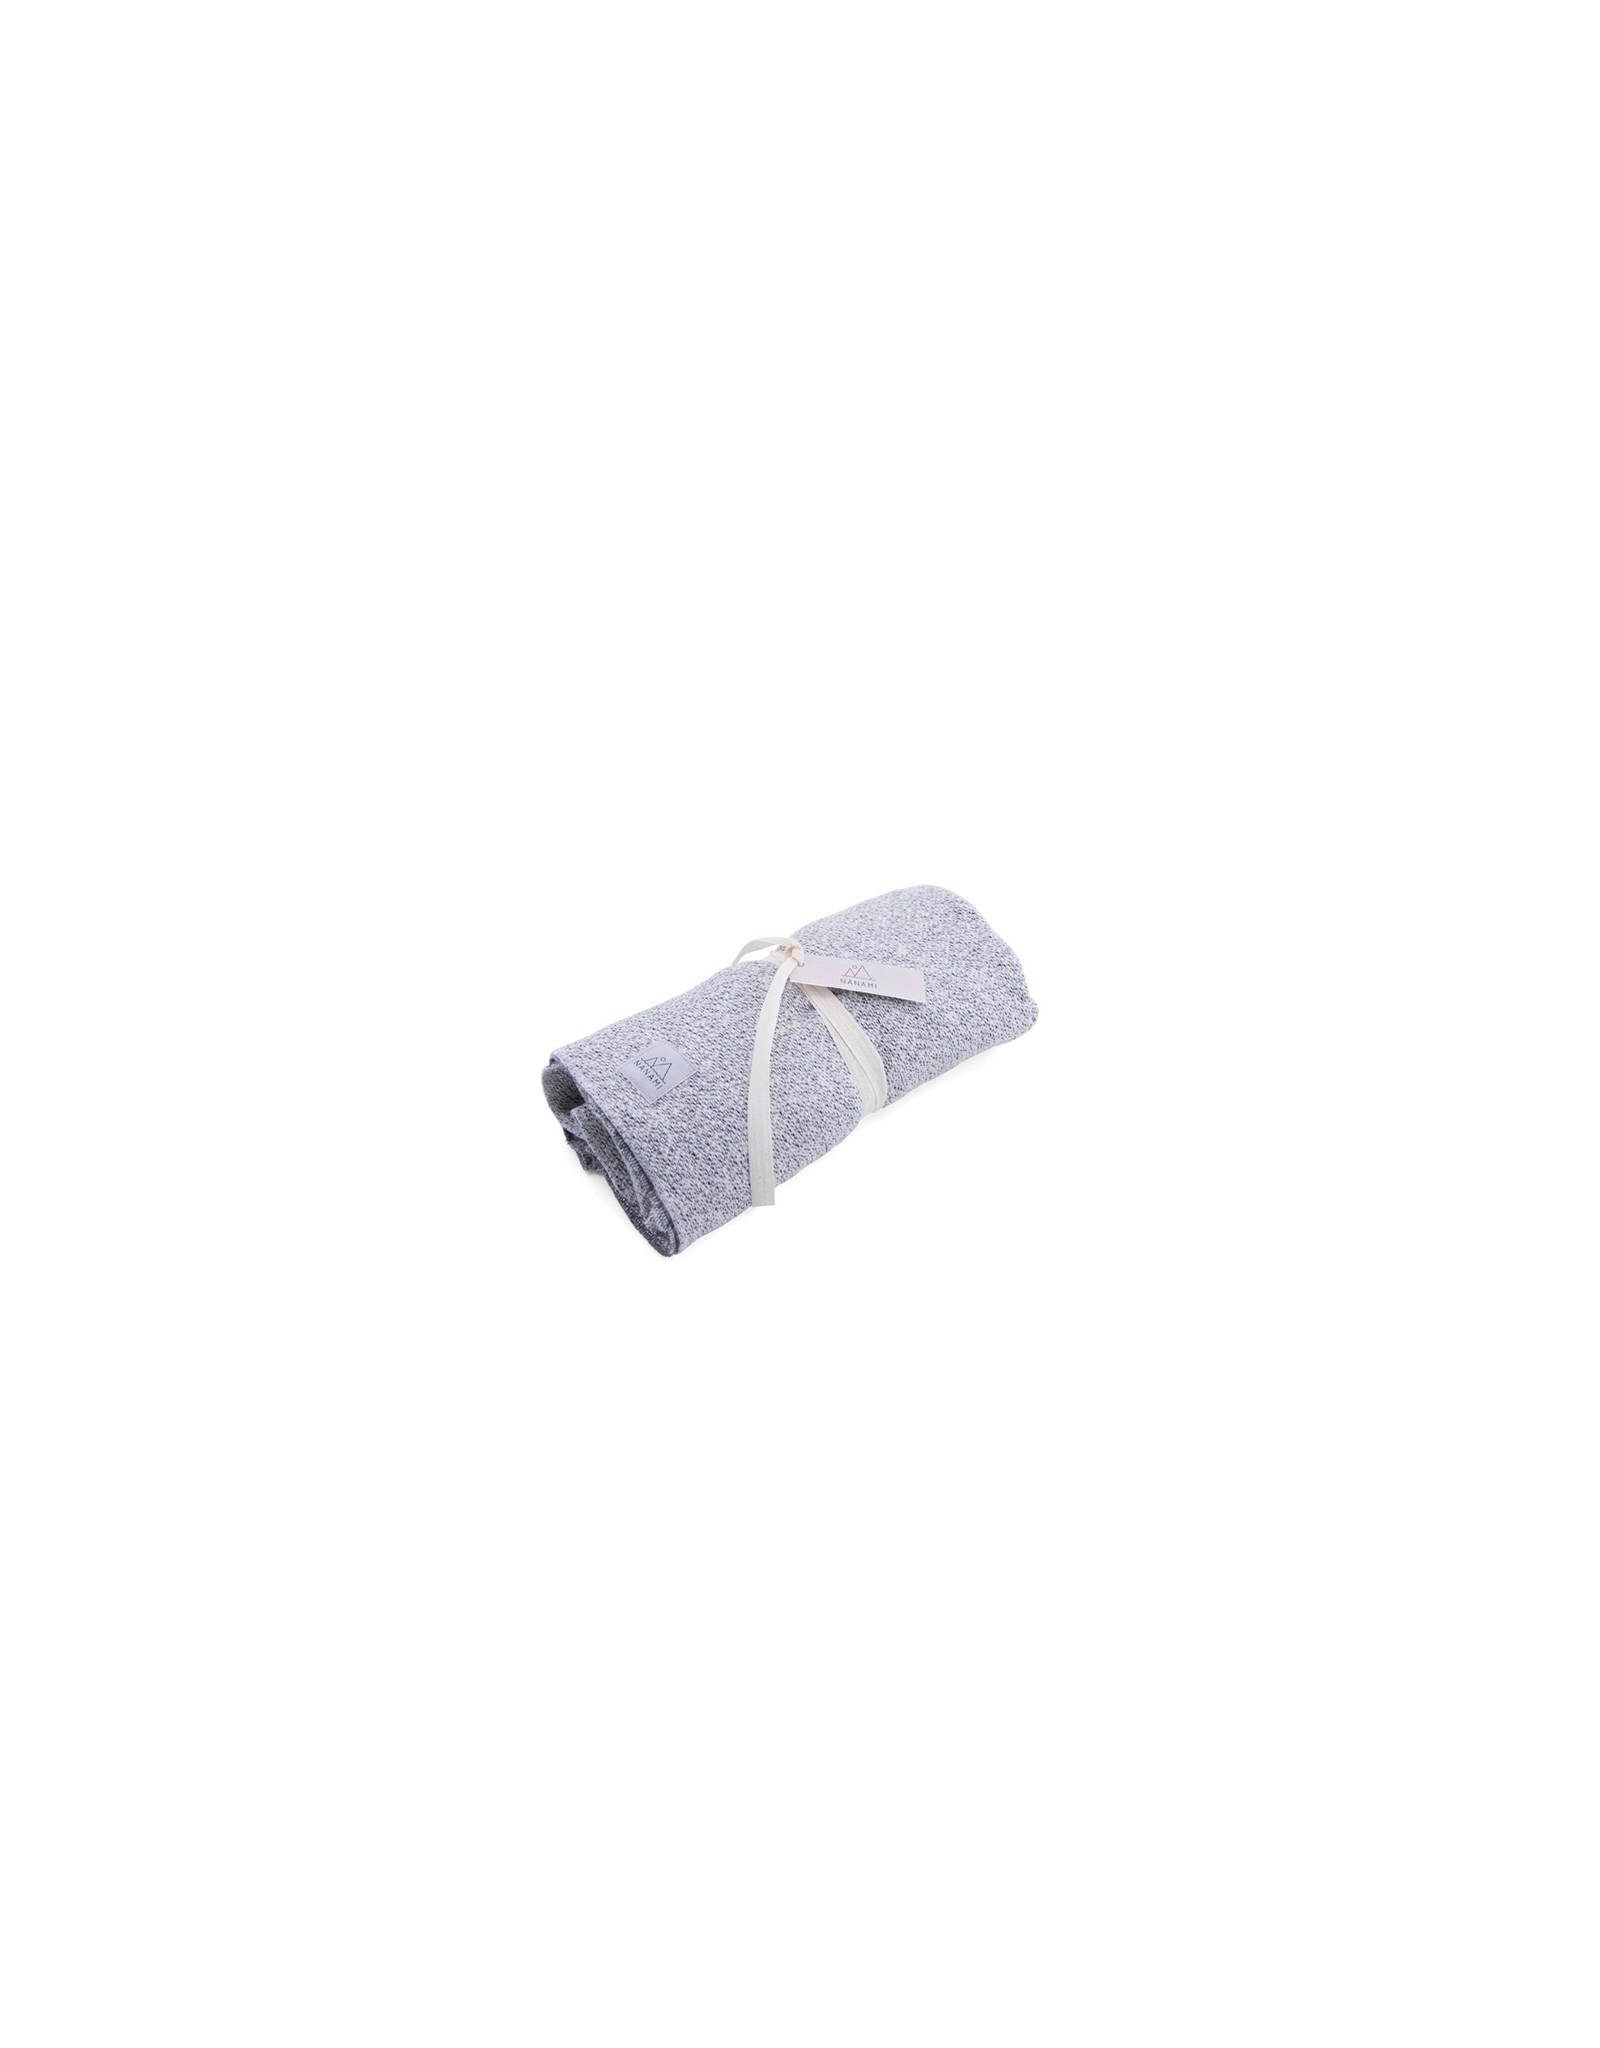 Nanami Nanami Blanket Soft Knit Look Grey